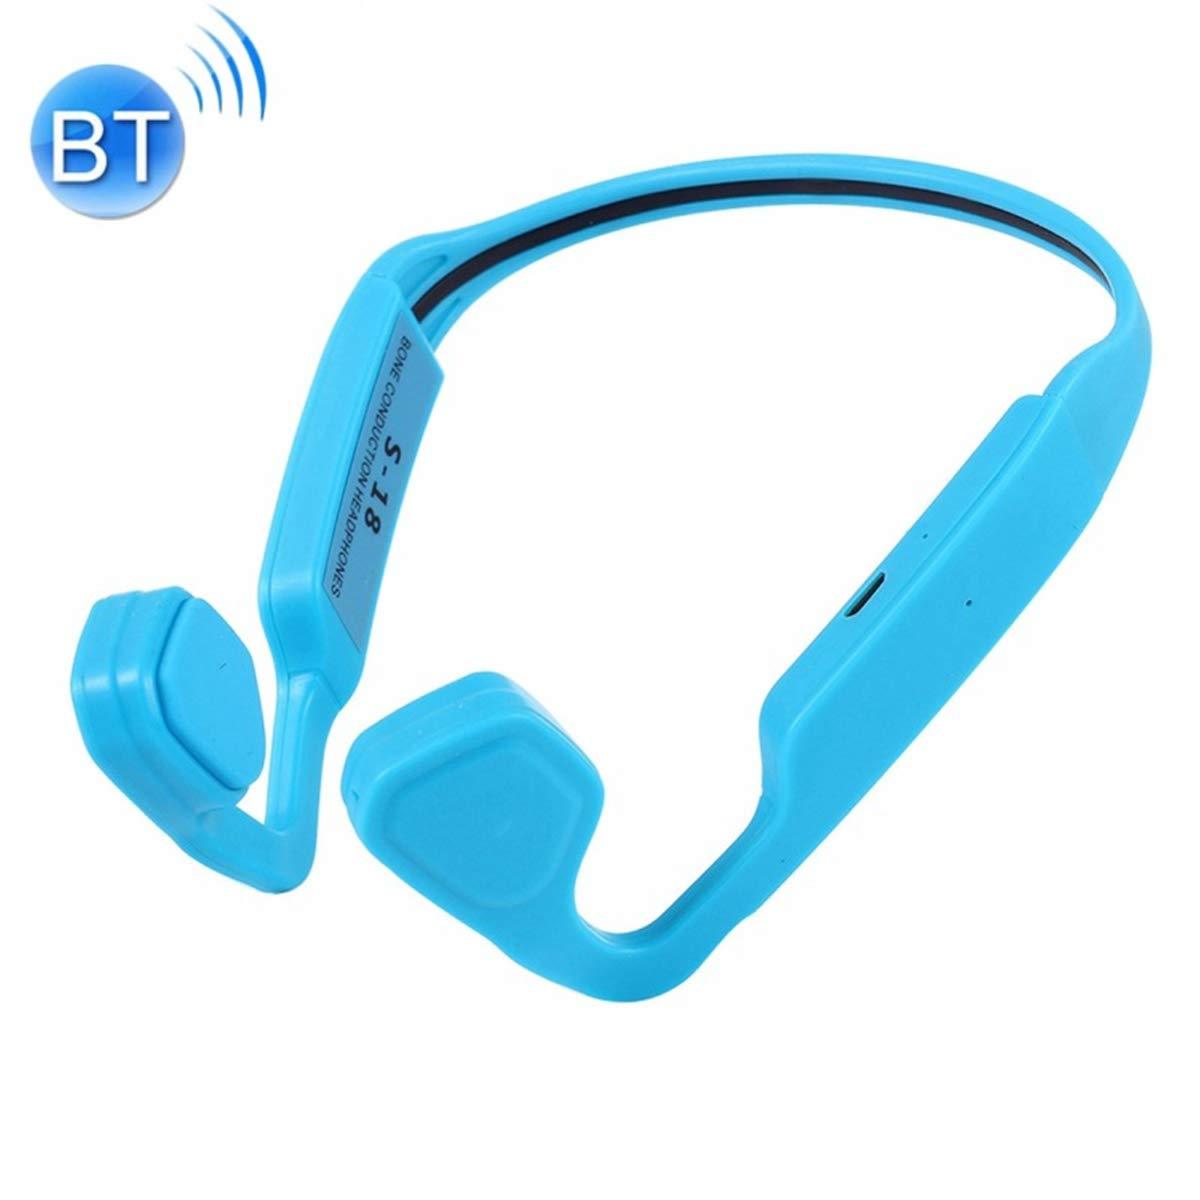 POPUPE S-18 Bone Conduction Bluetooth 4.1 Sports Outdoor Headphone (Blue)